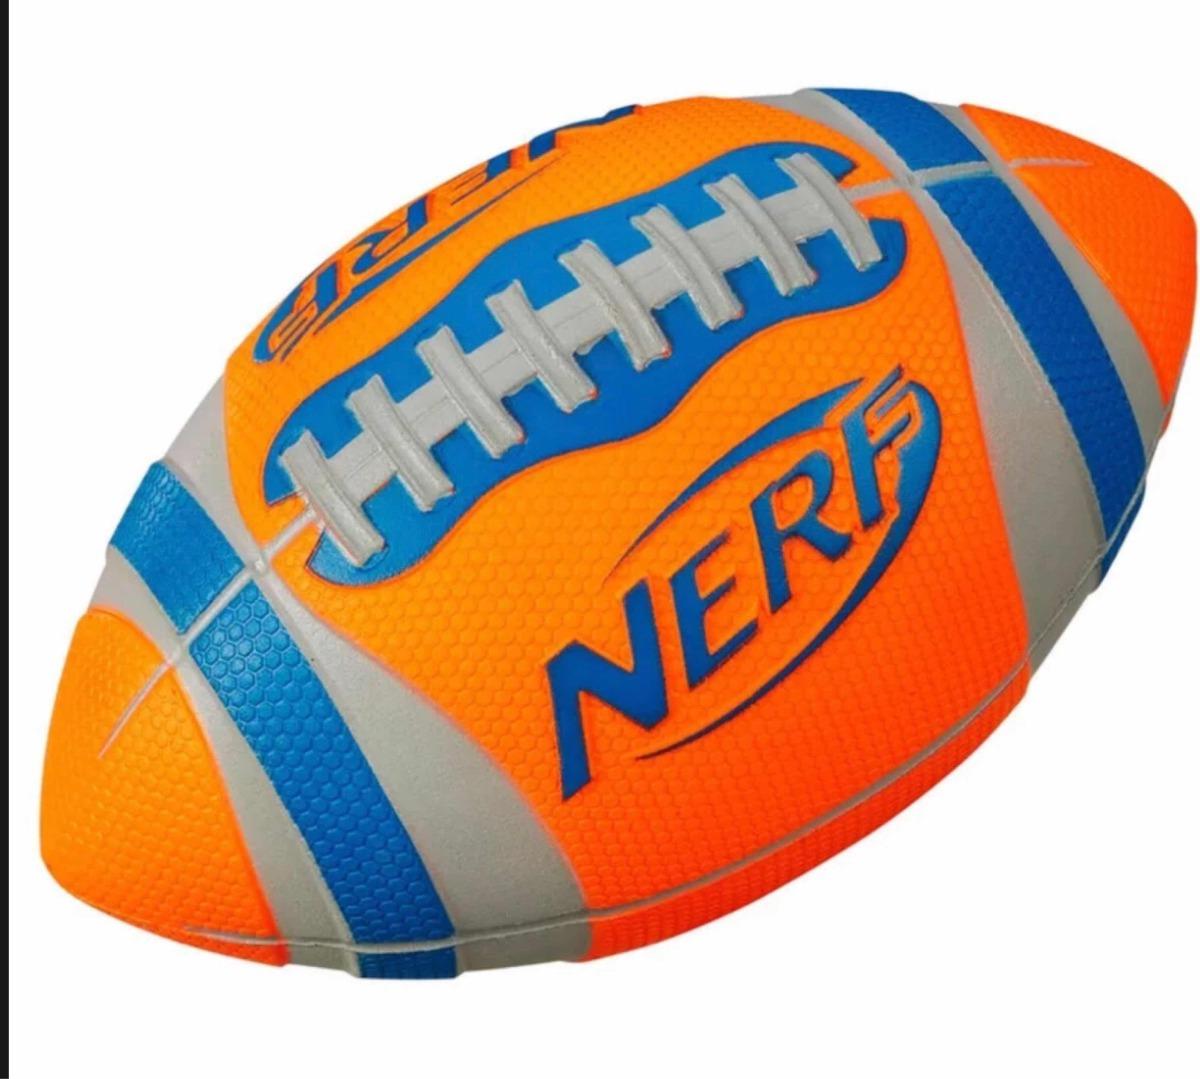 nerf sports - bola de futebol americano laranja - hasbro. Carregando zoom. 4d80bc68b7742